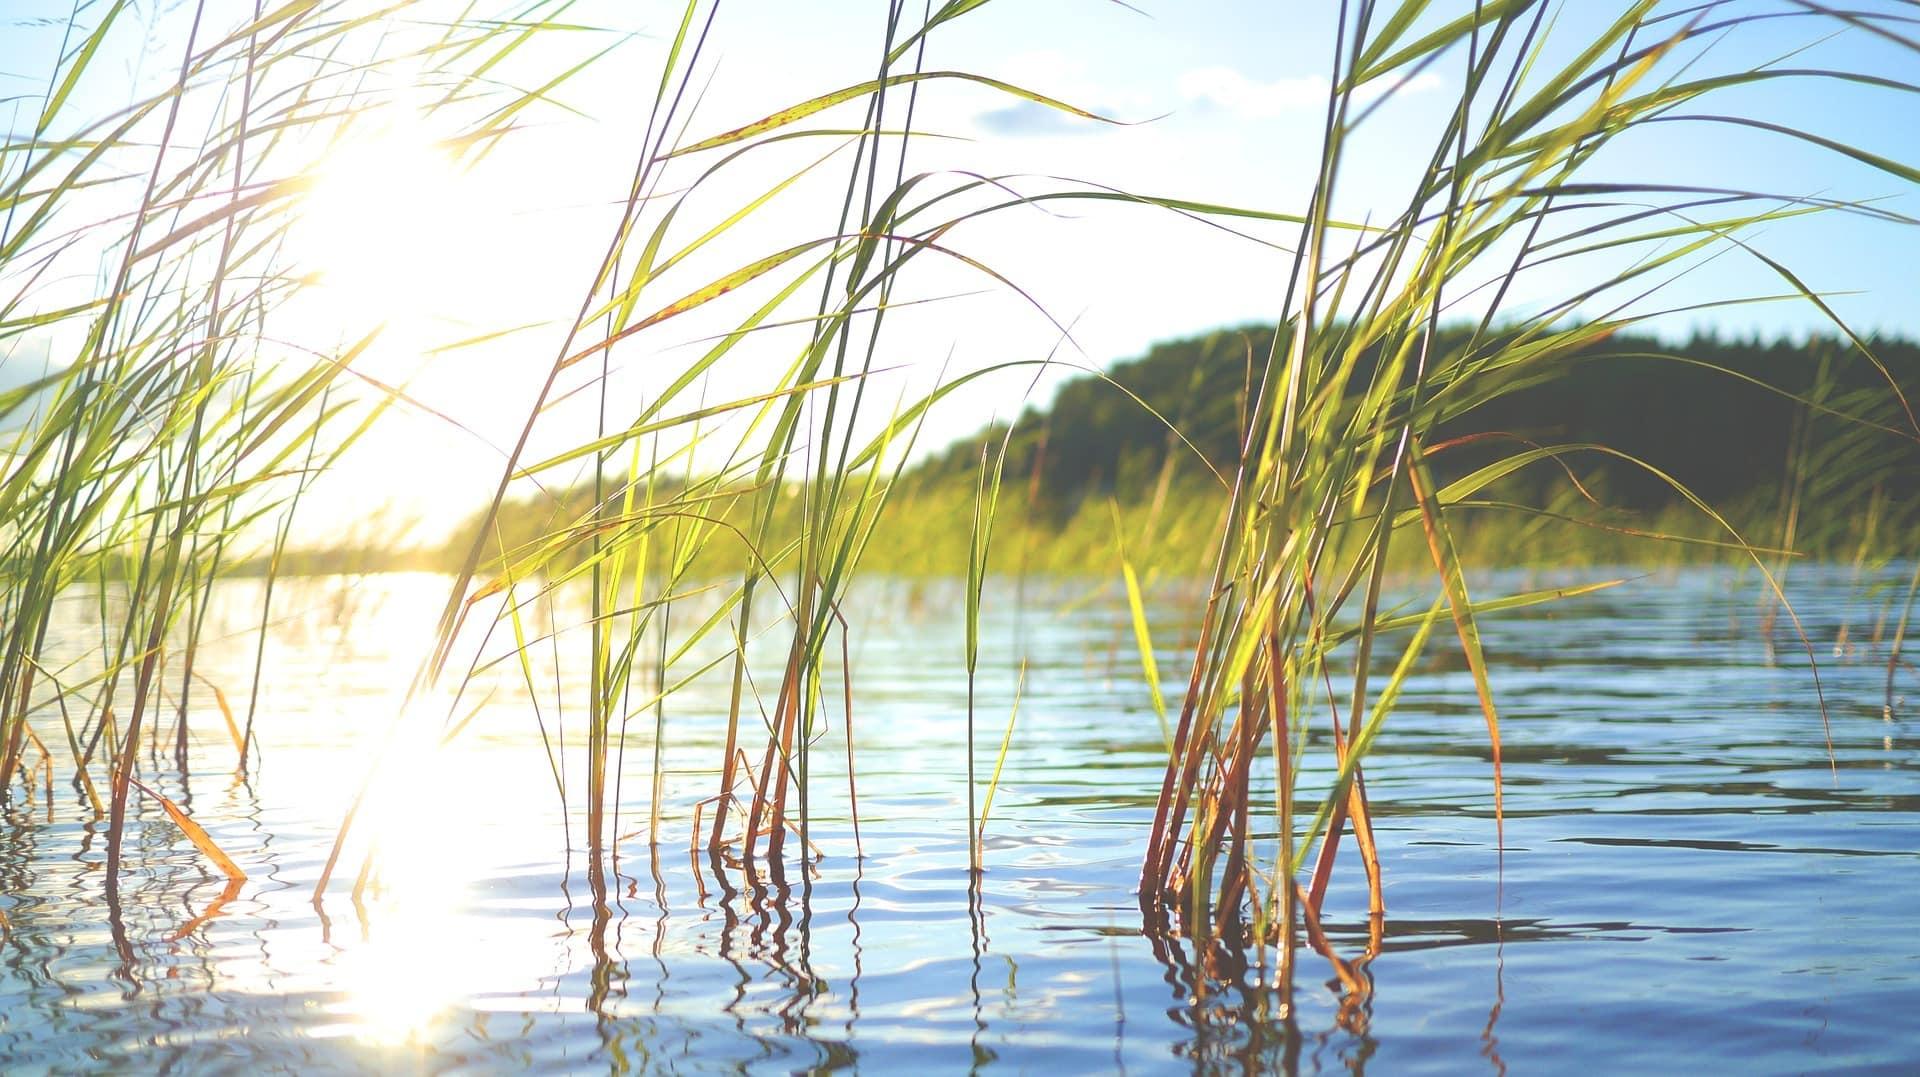 Päijänne ist ein See in Finnland